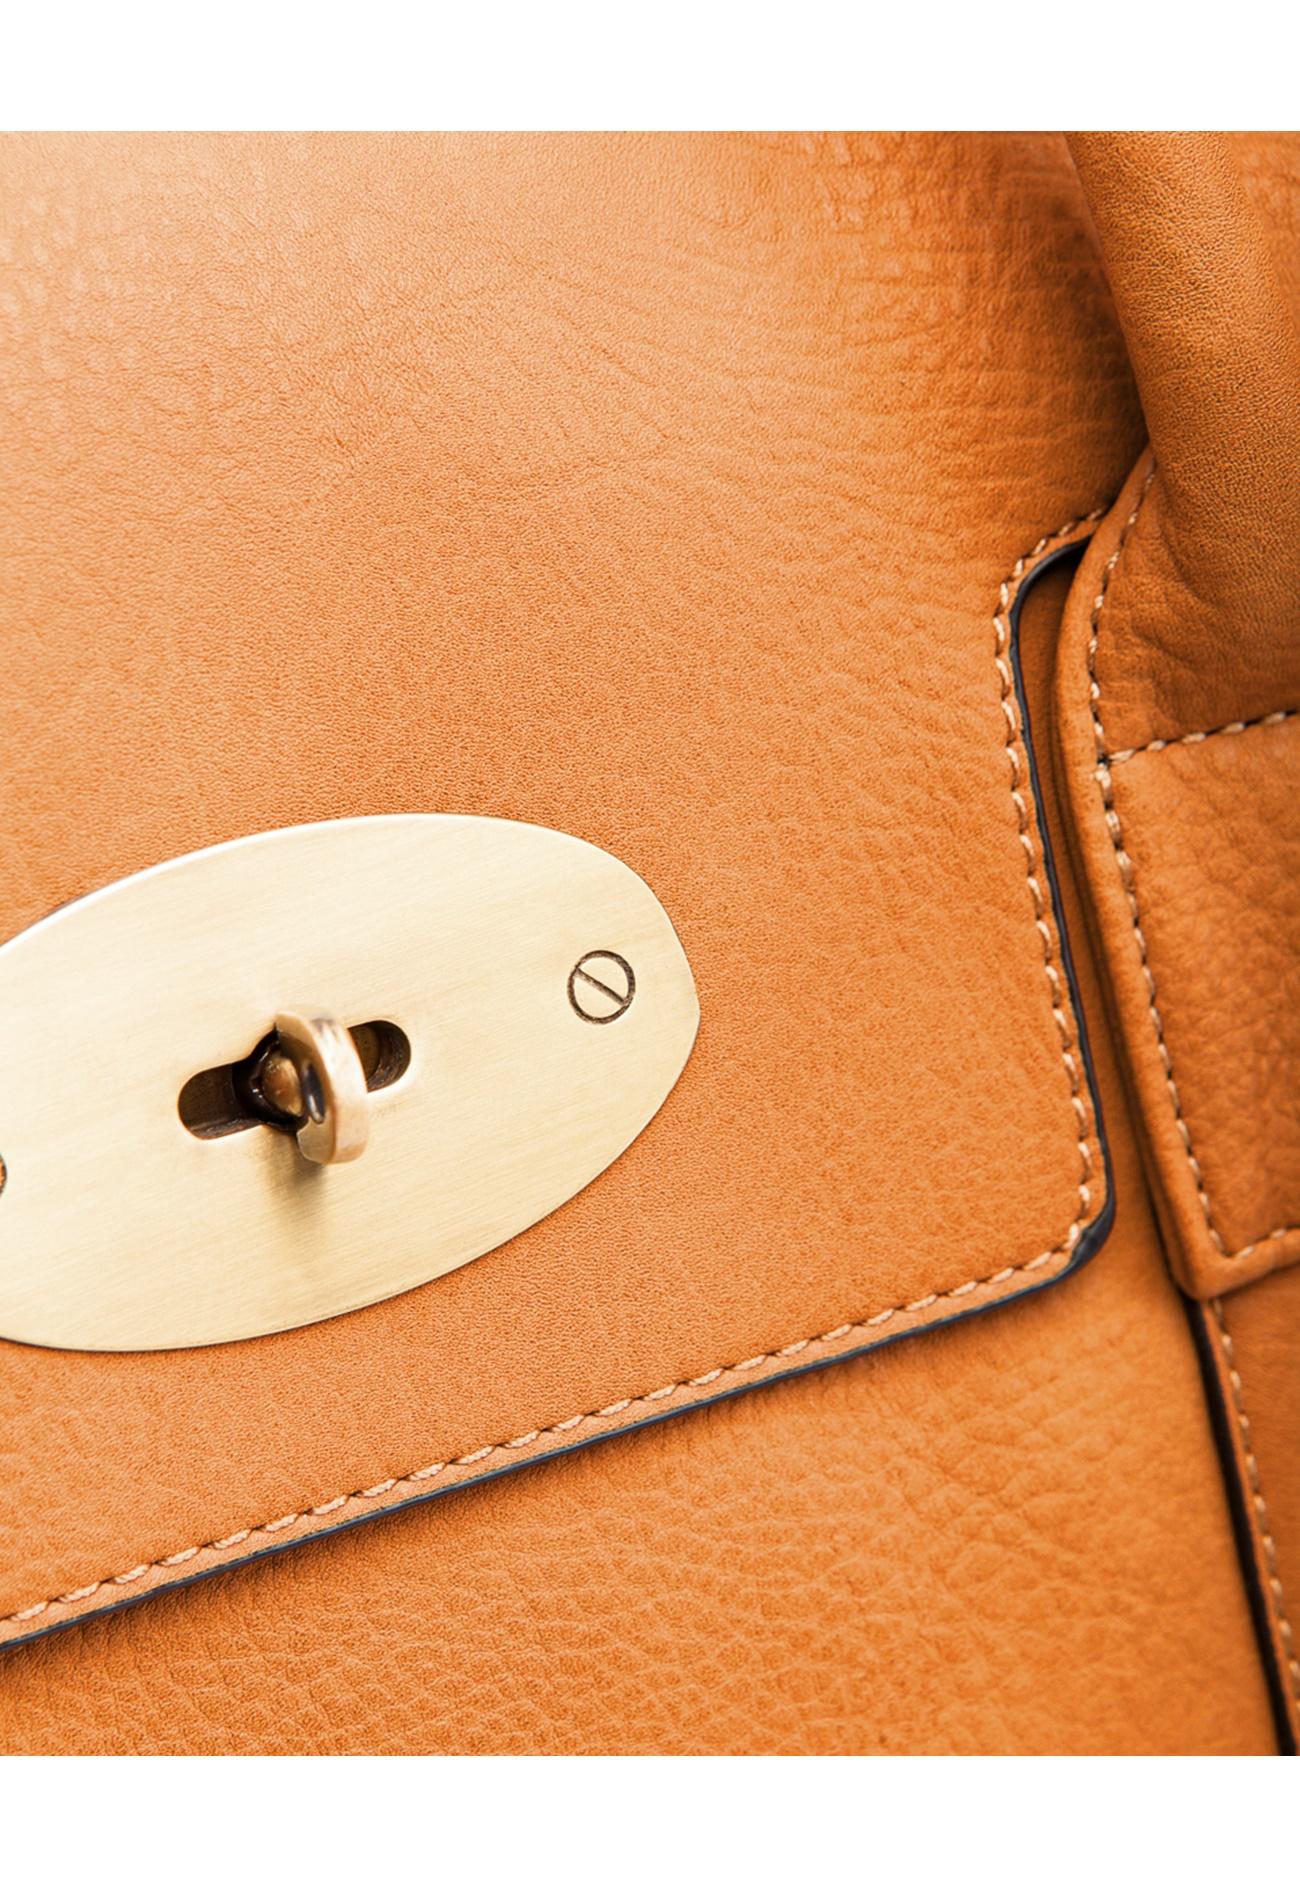 Oranssi Käsilaukku : Have k?silaukku kilmay ruskea oranssi bubbleroom